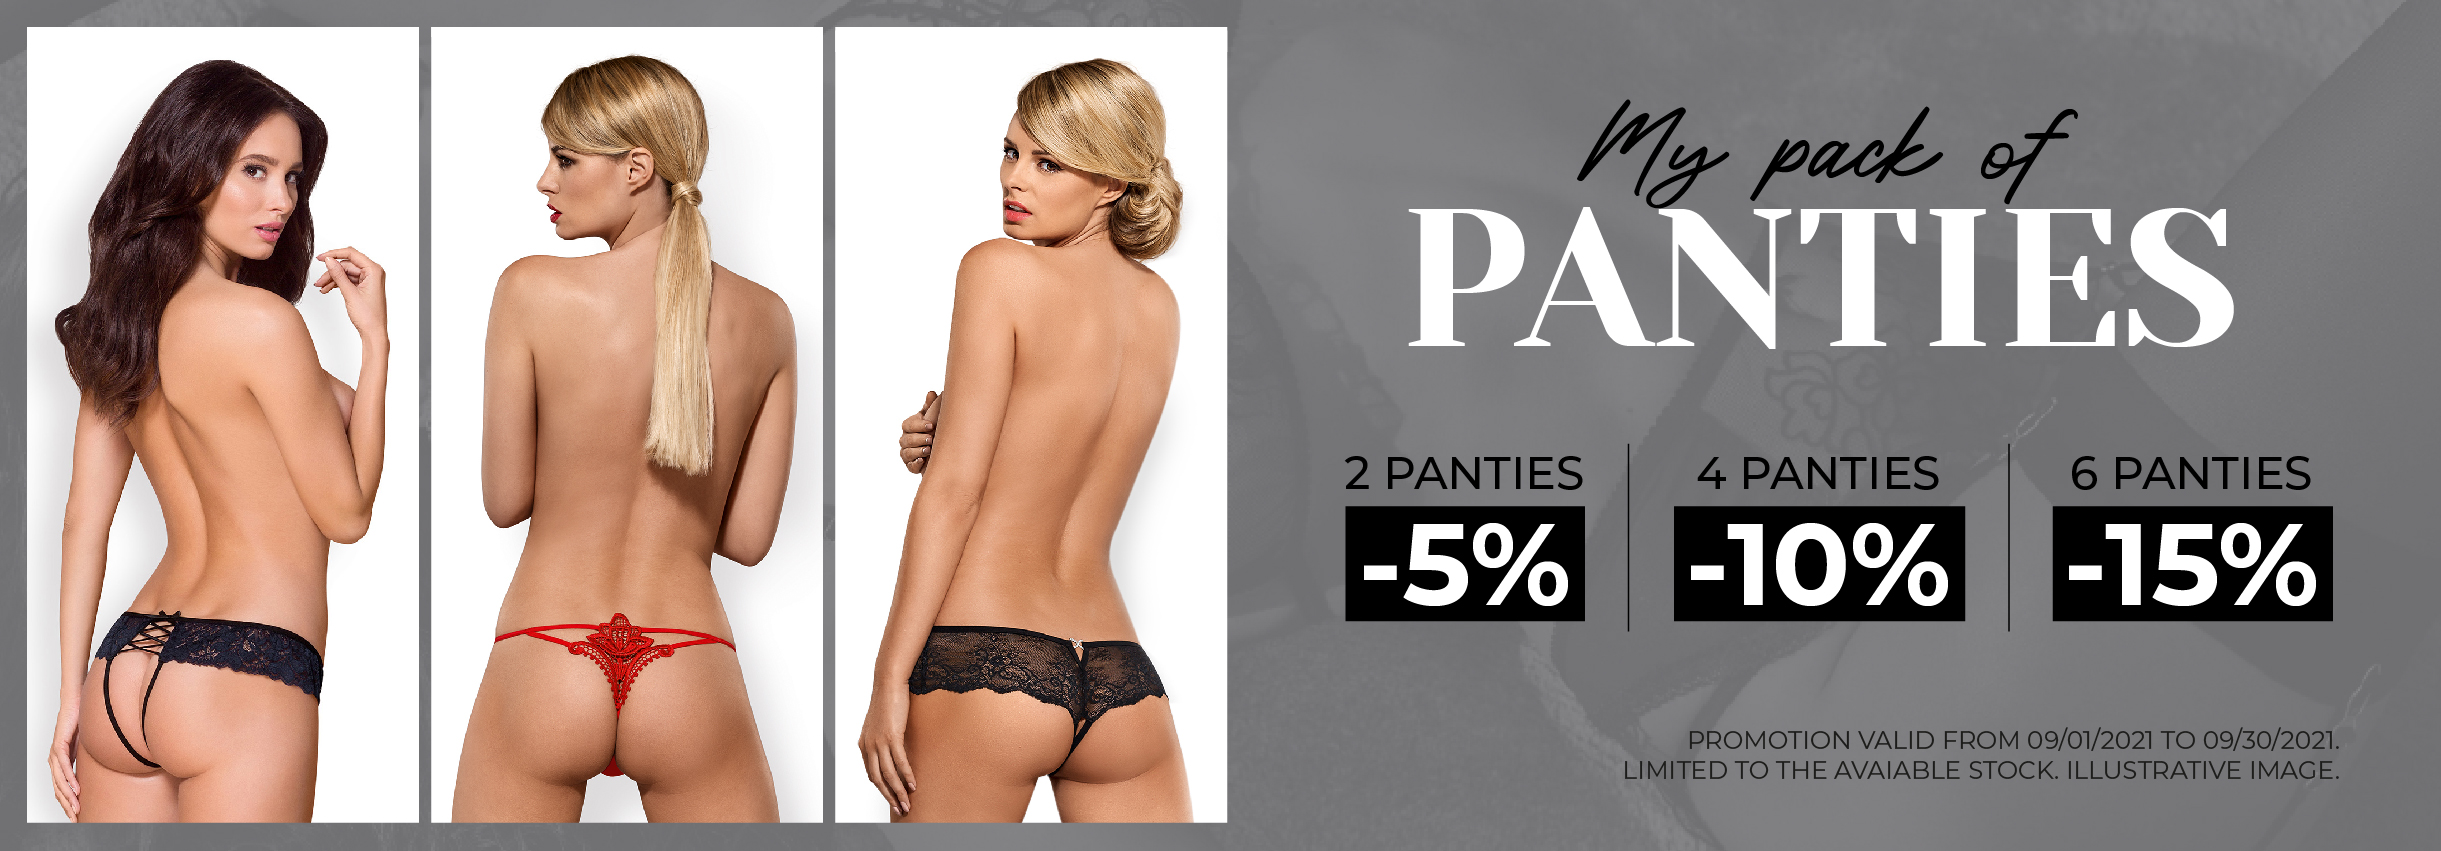 Panties promotion